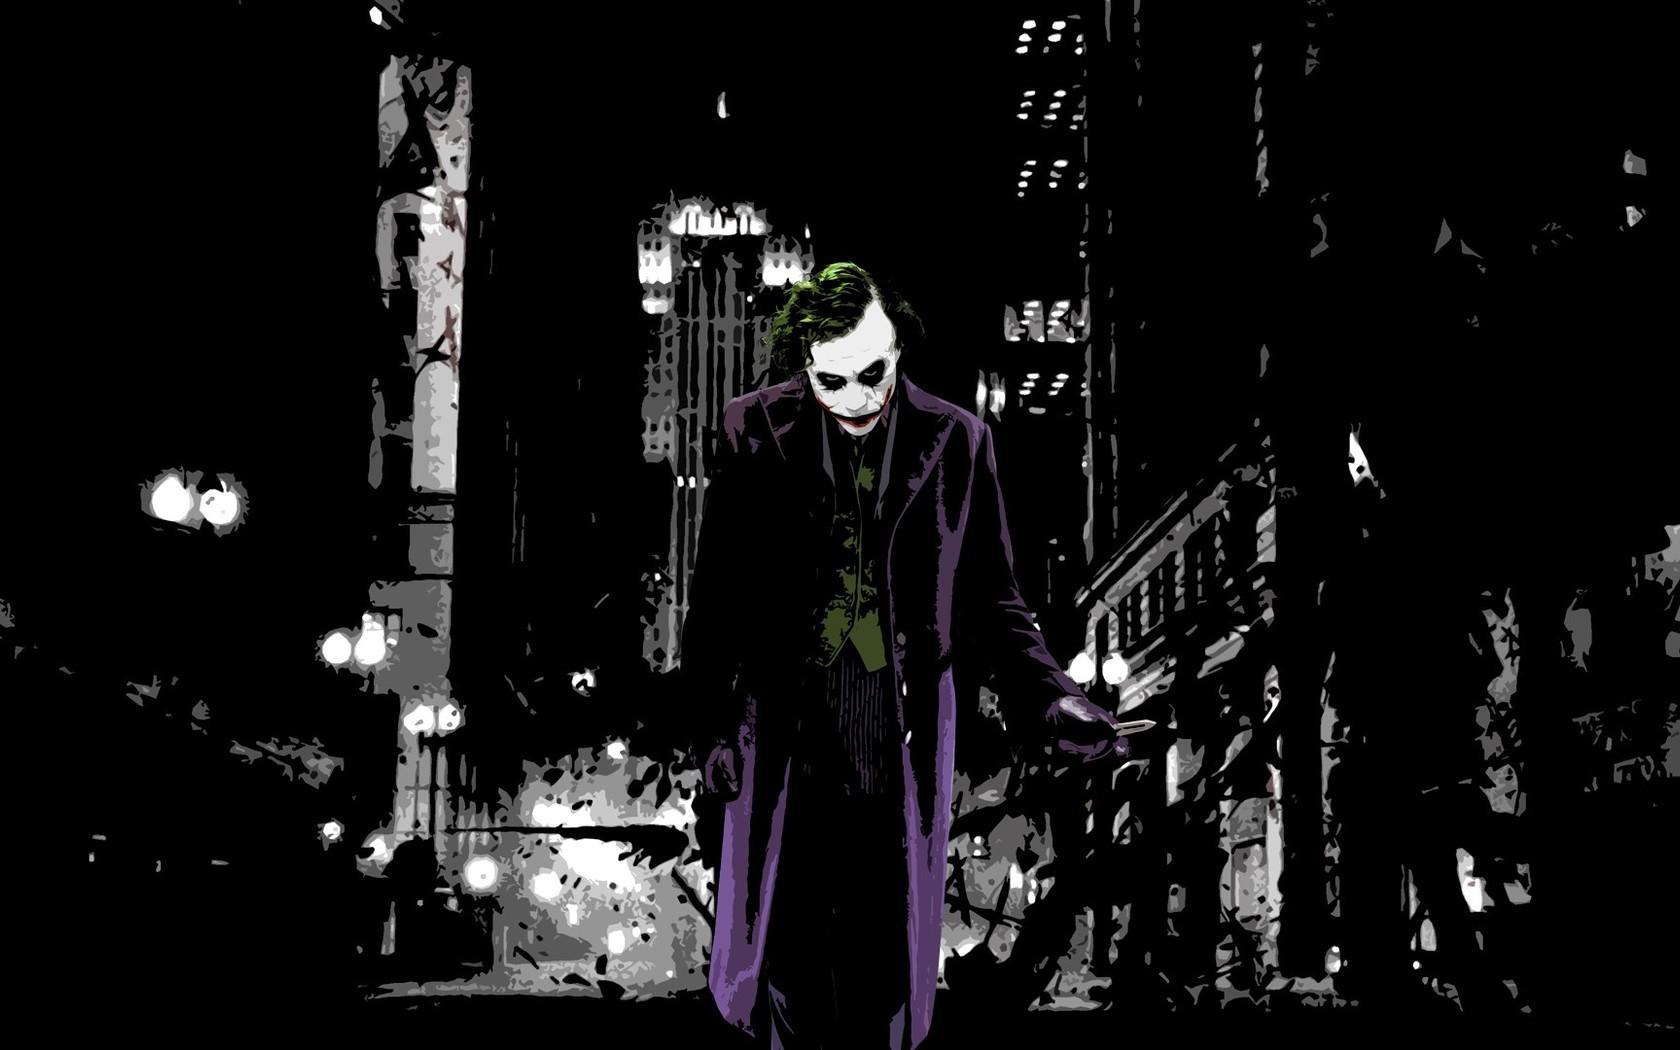 The Joker   The Dark Knight wallpaper 4989 1680x1050